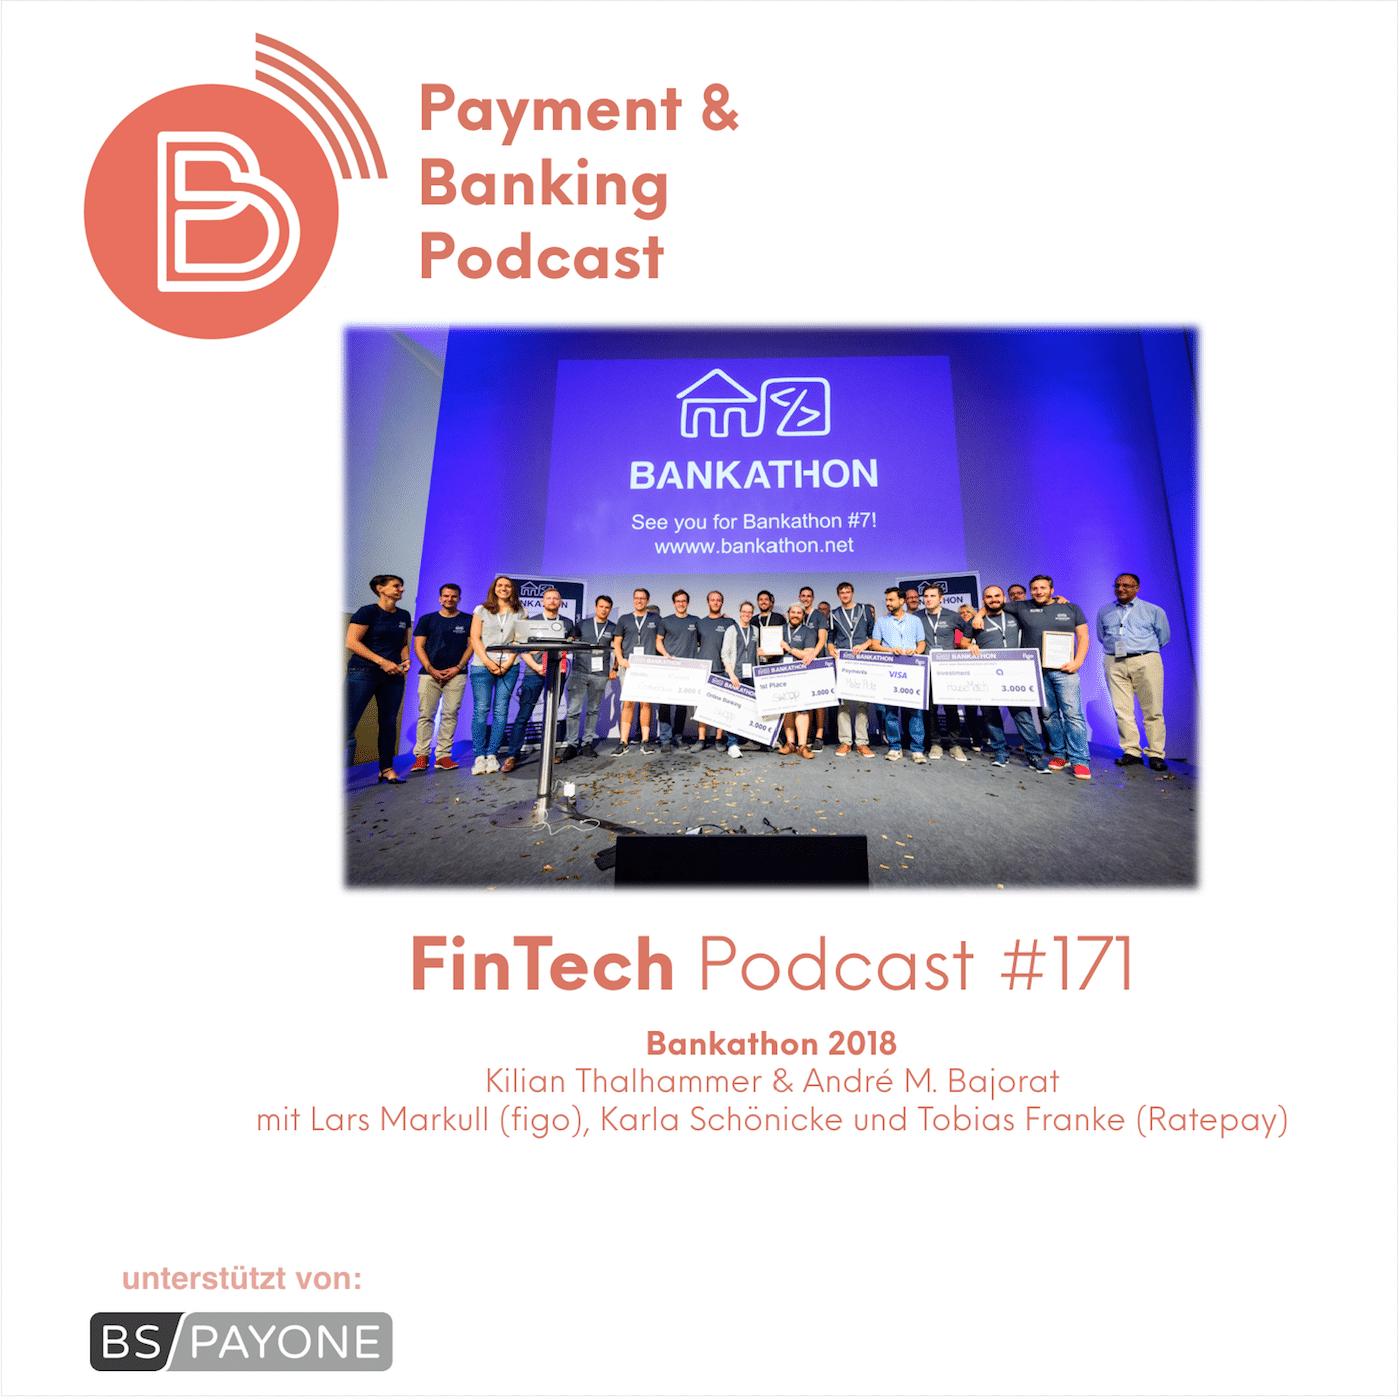 FIntech Podcast #171 - Bankathon #6